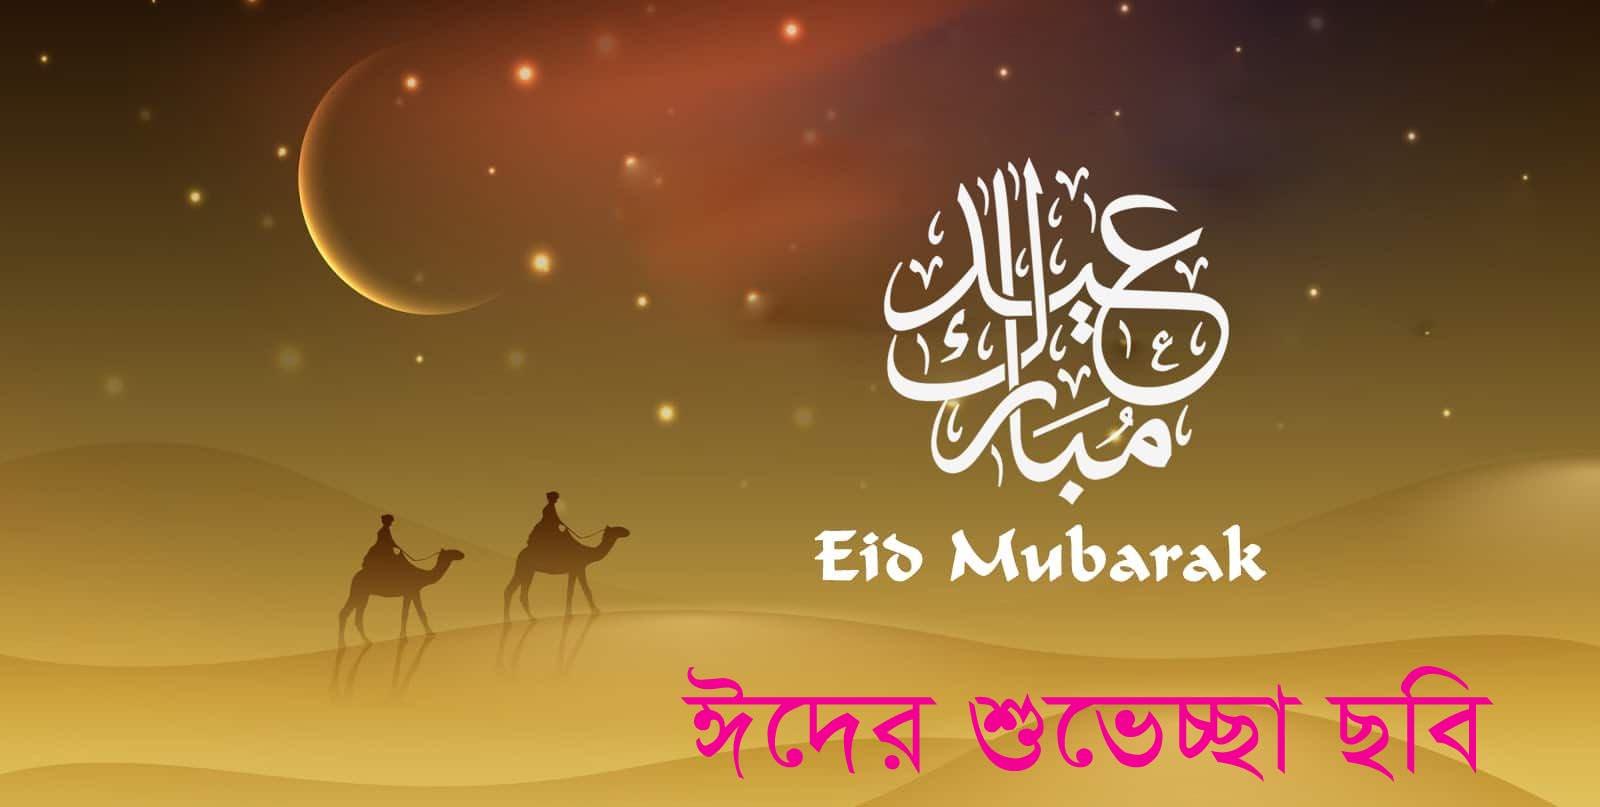 Eid Poster Design। Photos, Logos, illustrations   ঈদ পোস্টার ডিজাইন